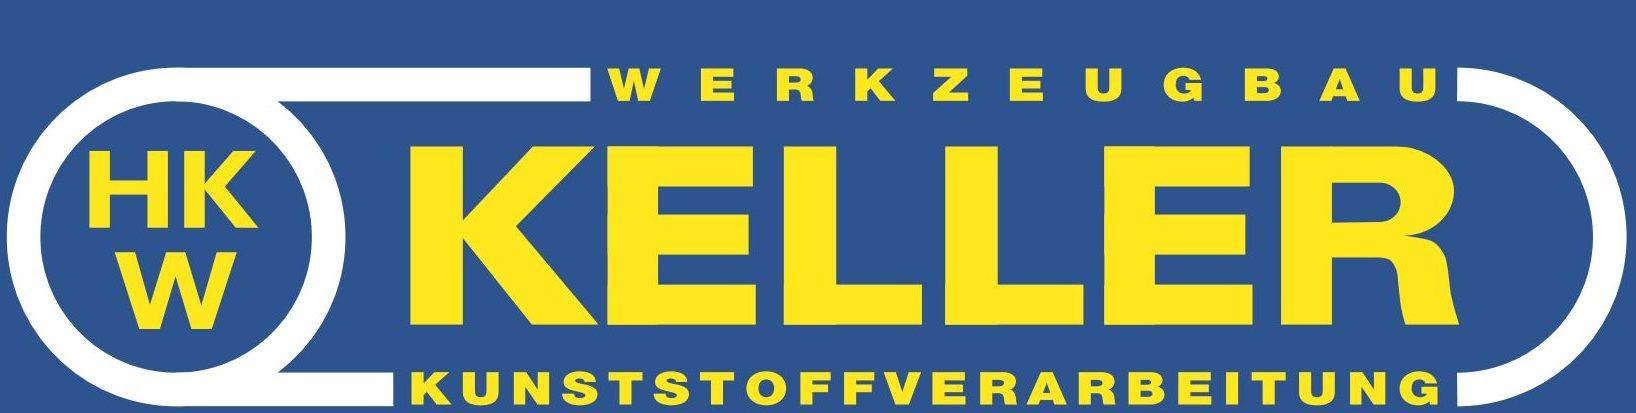 Horst Keller Werkzeugbau GmbH